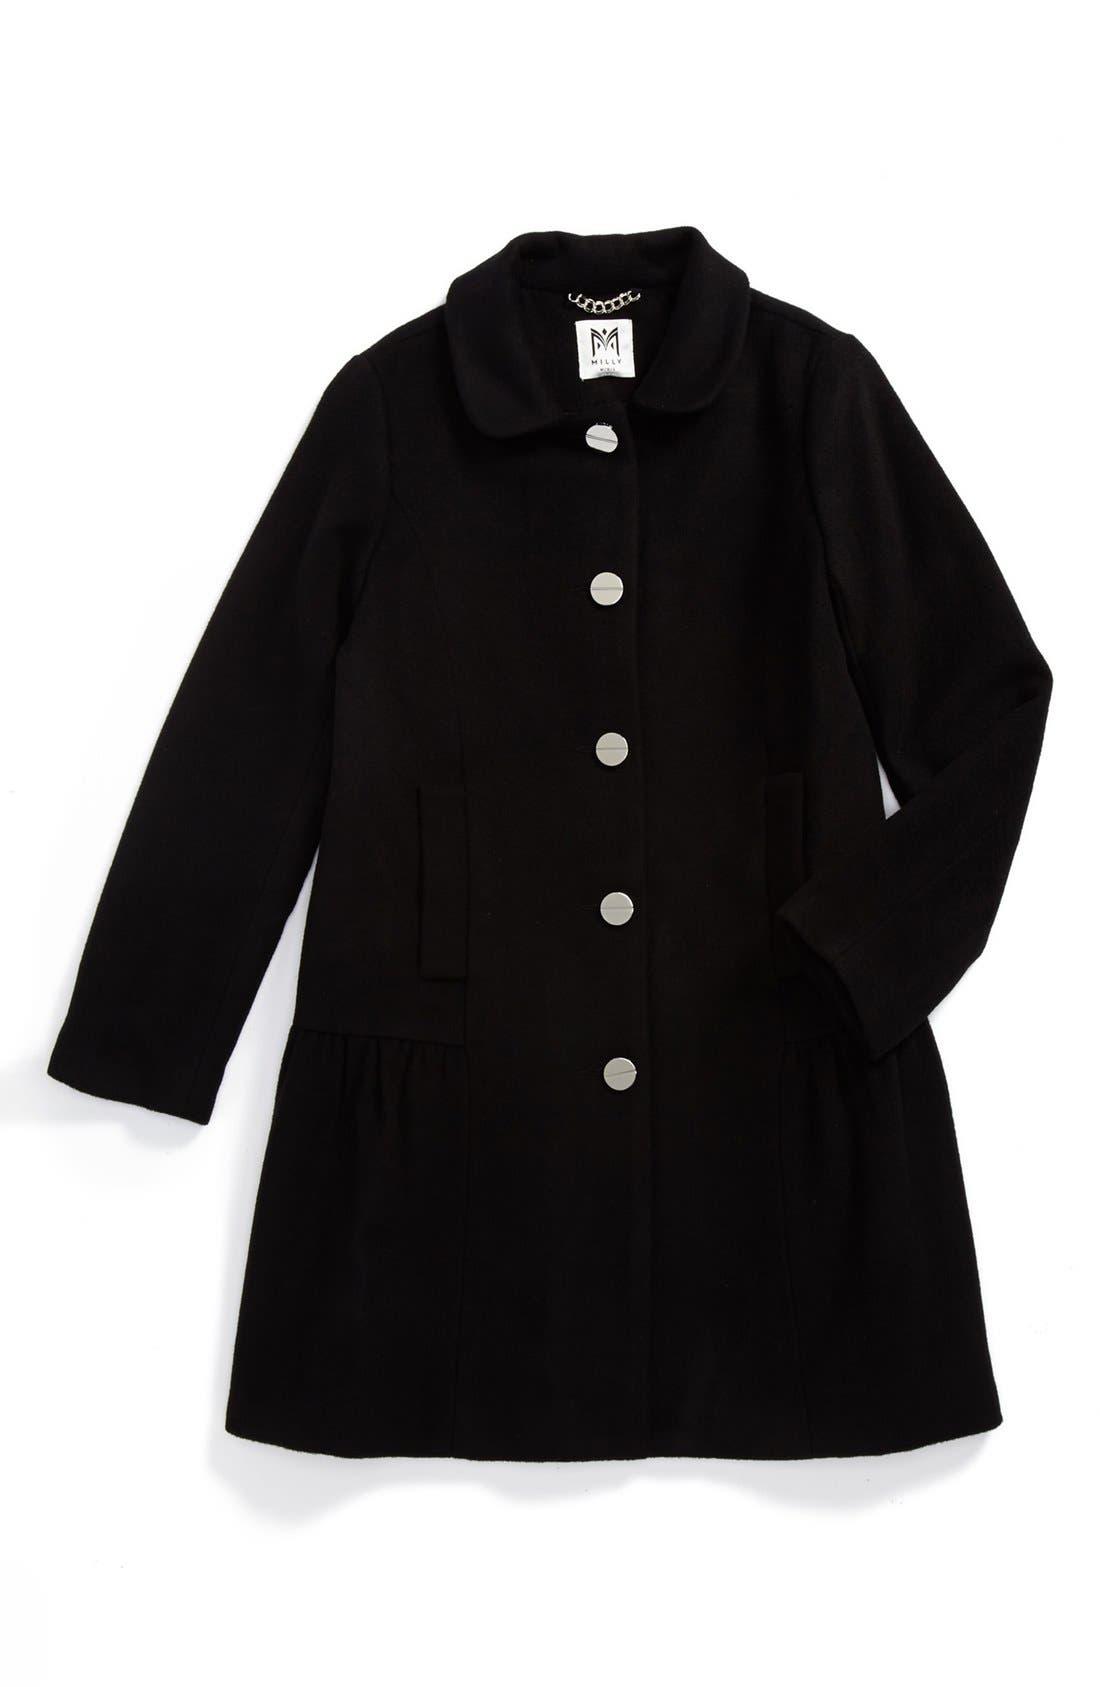 Alternate Image 1 Selected - Milly Minis 'Zoey' Peplum Coat (Big Girls)